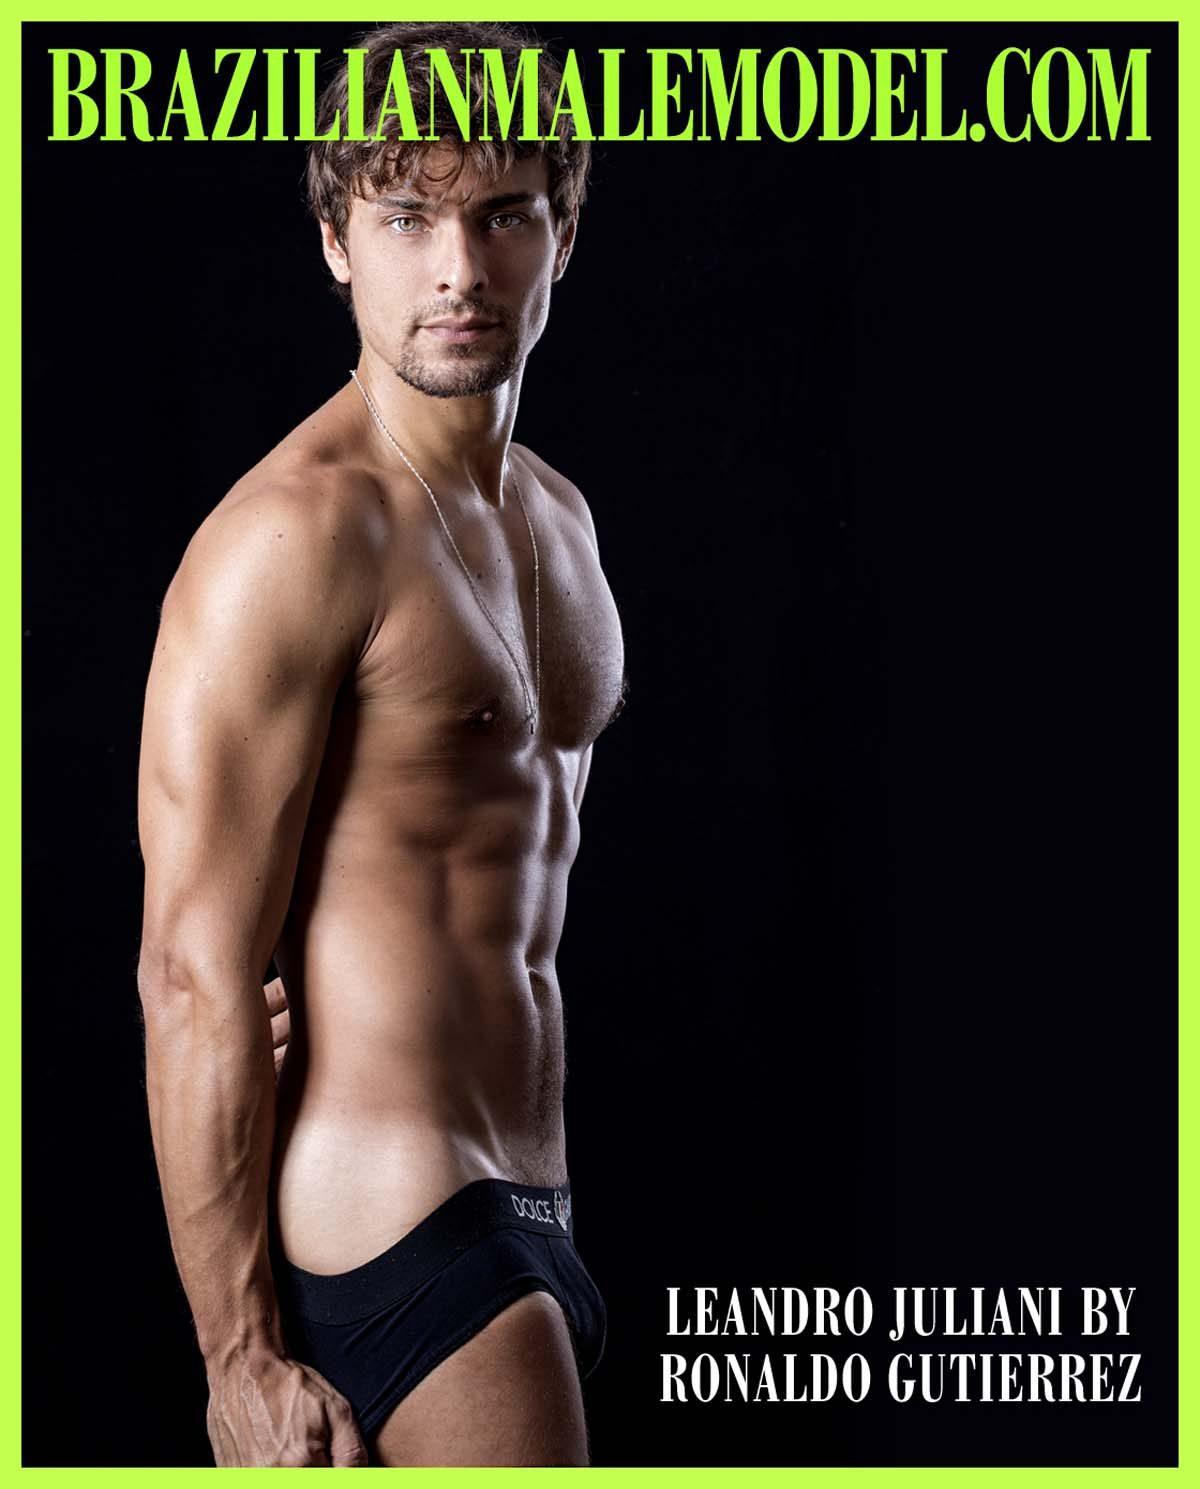 Leandro Juliani by Ronaldo Gutierrez